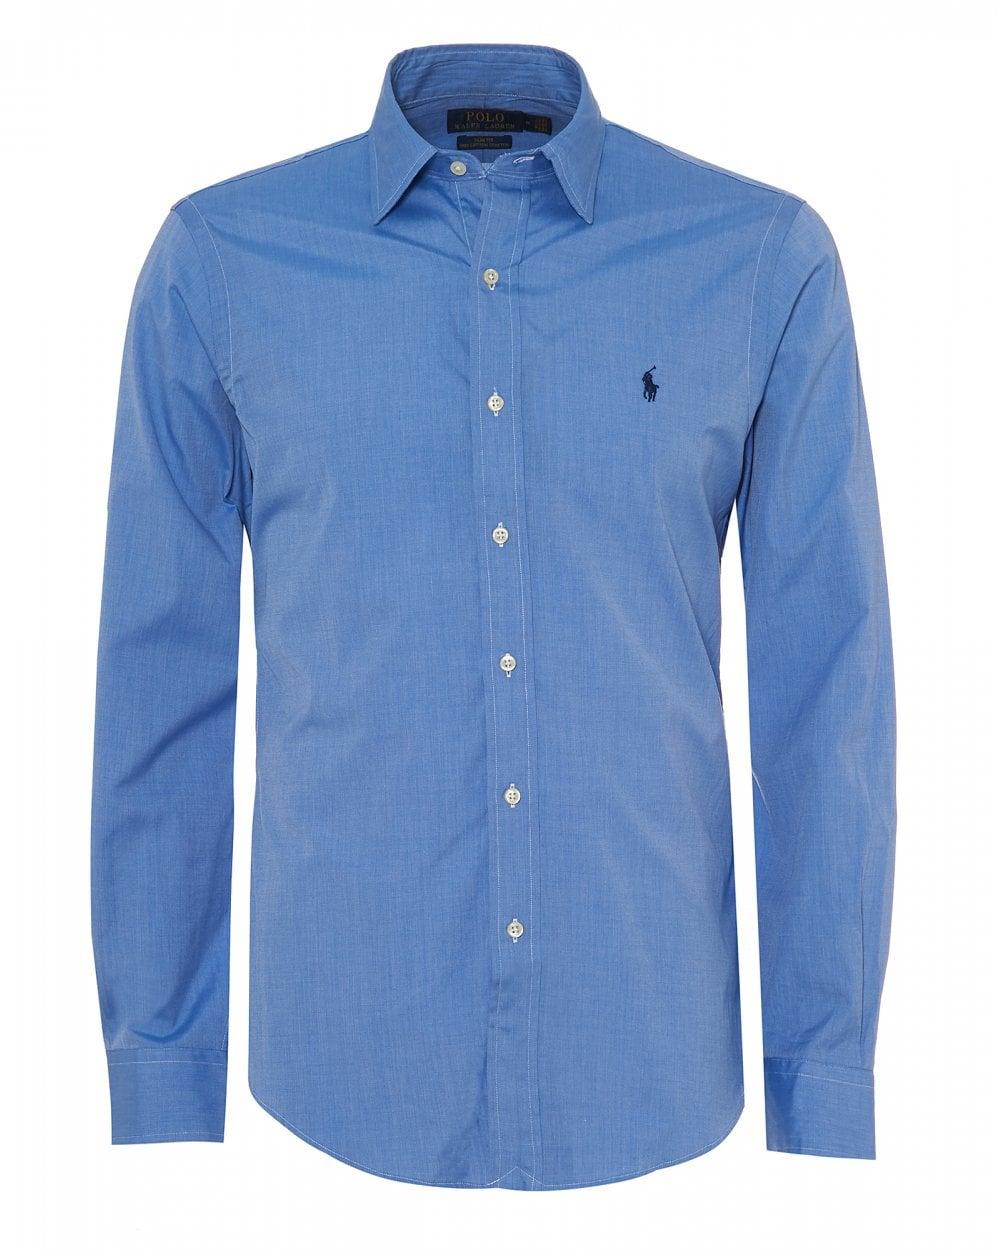 Ralph Lauren Mens Luxury Oxford Shirt Blue End On End Slim Fit Shirt